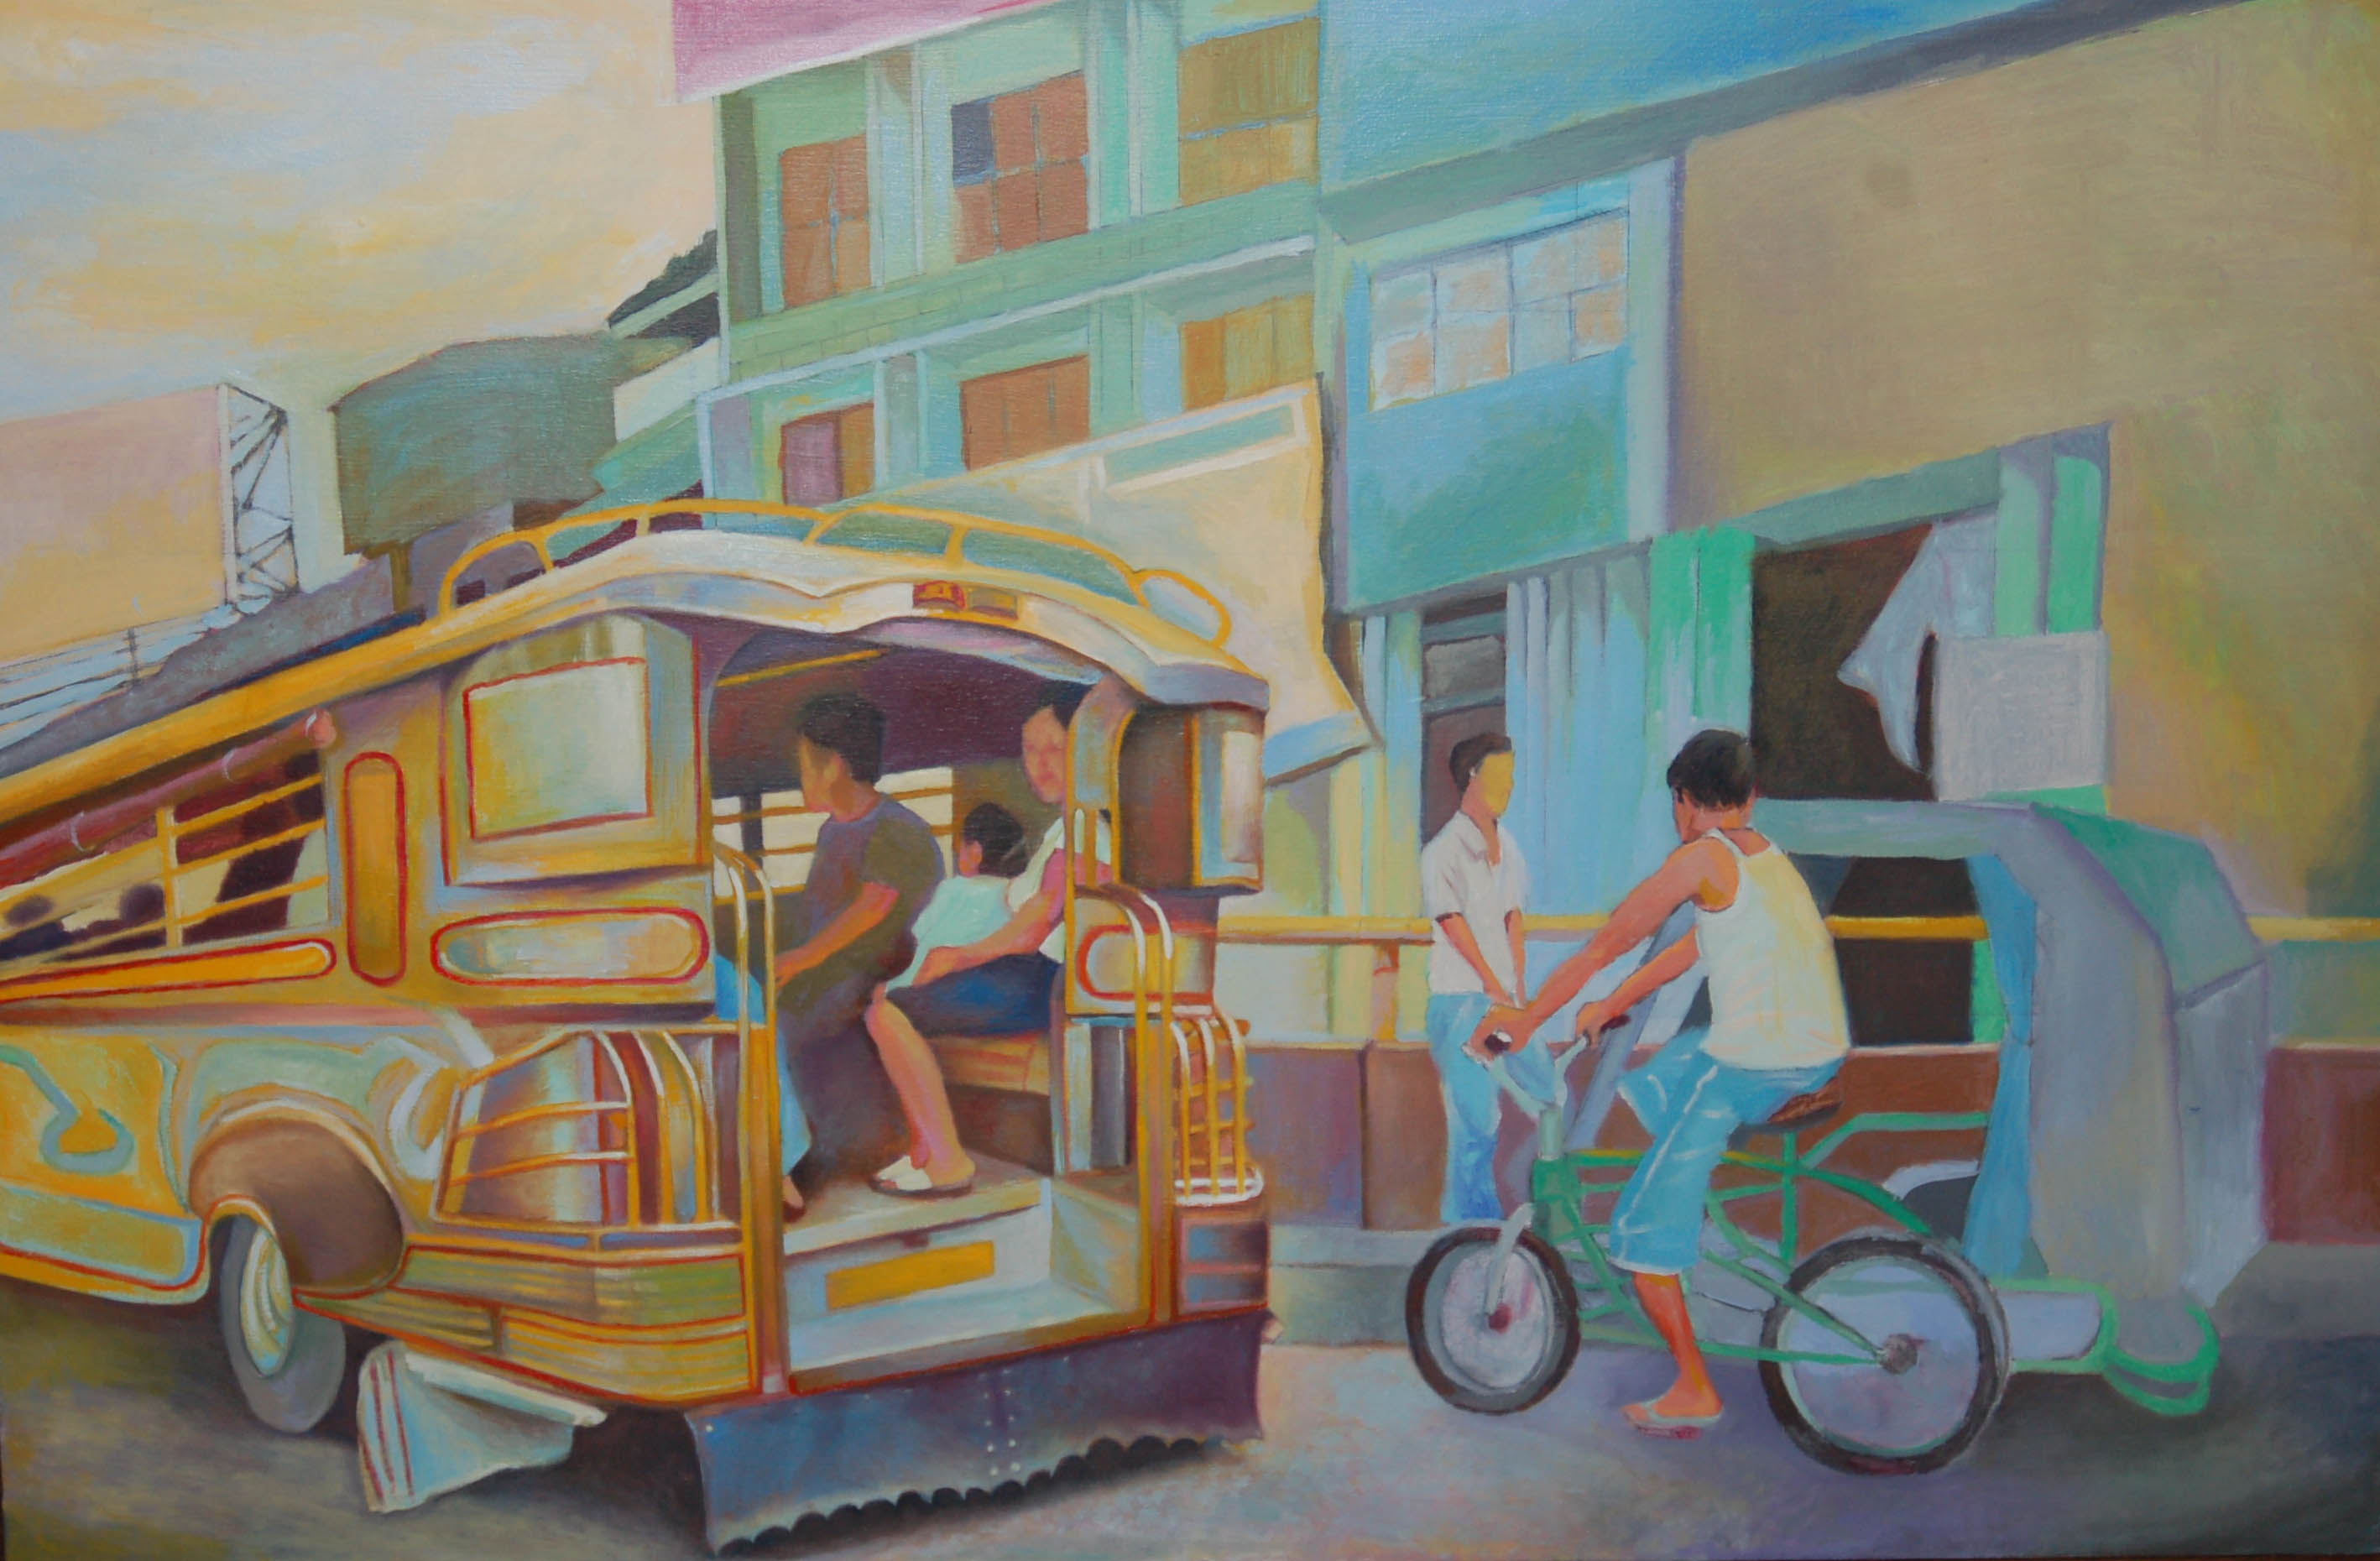 Manila x 2 scene 3 - 1 7